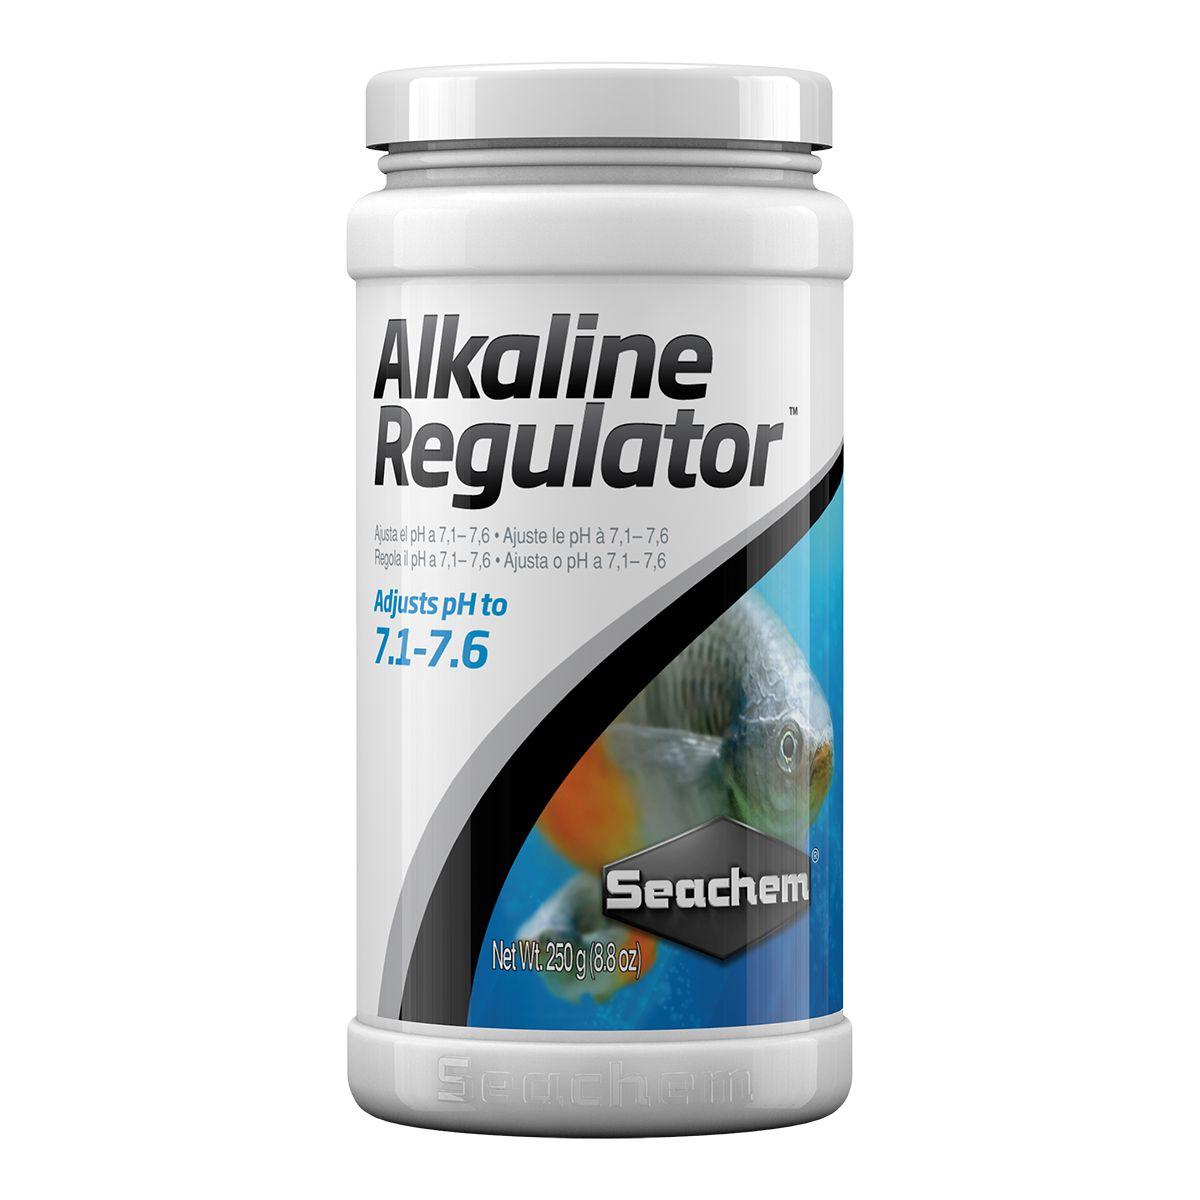 Regulador de pH Alcalino SEACHEM ALKALINE REGULATOR 250G